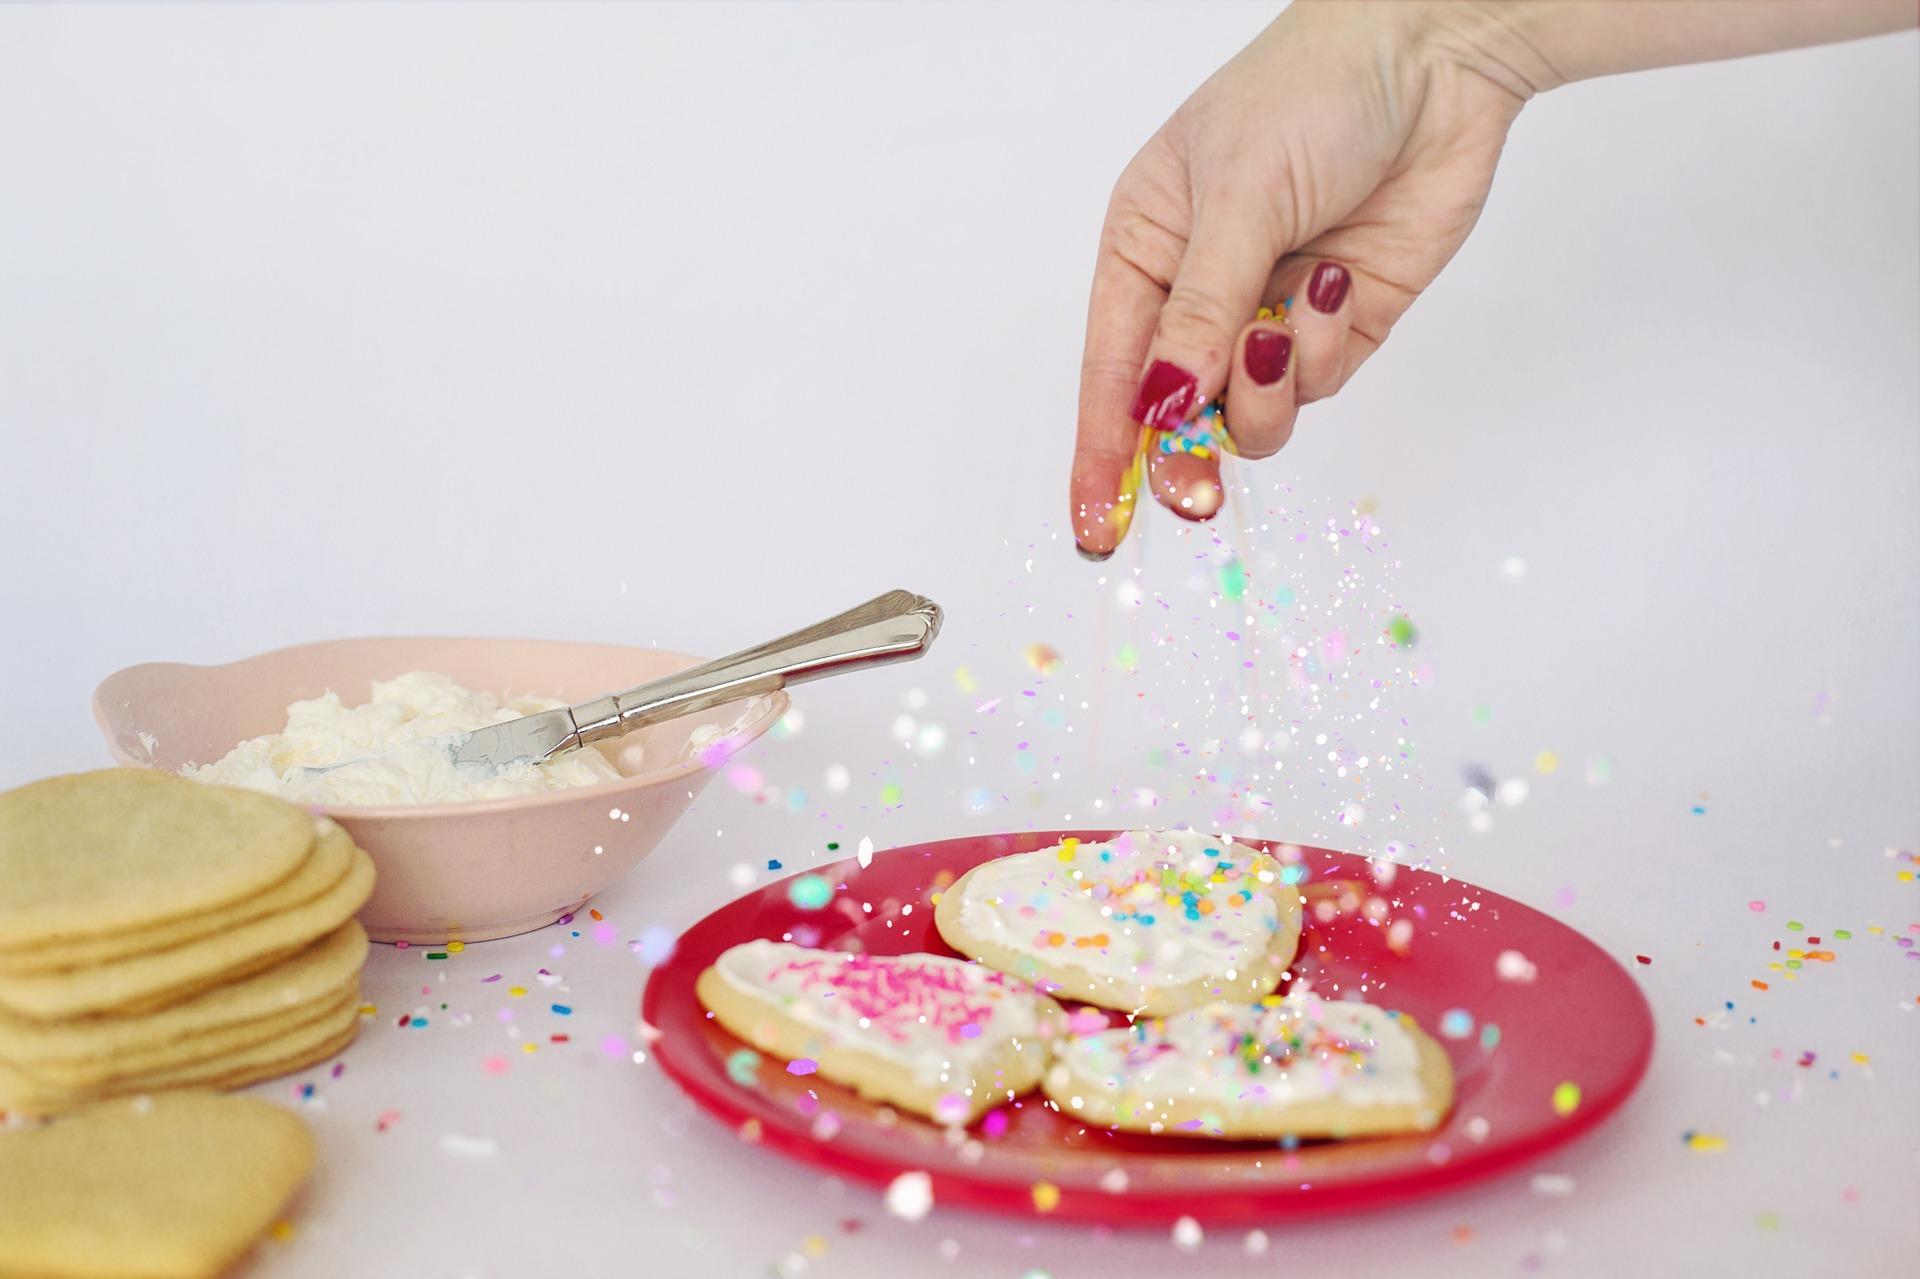 Sugar Cookie Decorating, hand dropping sprinkles onto cookies.